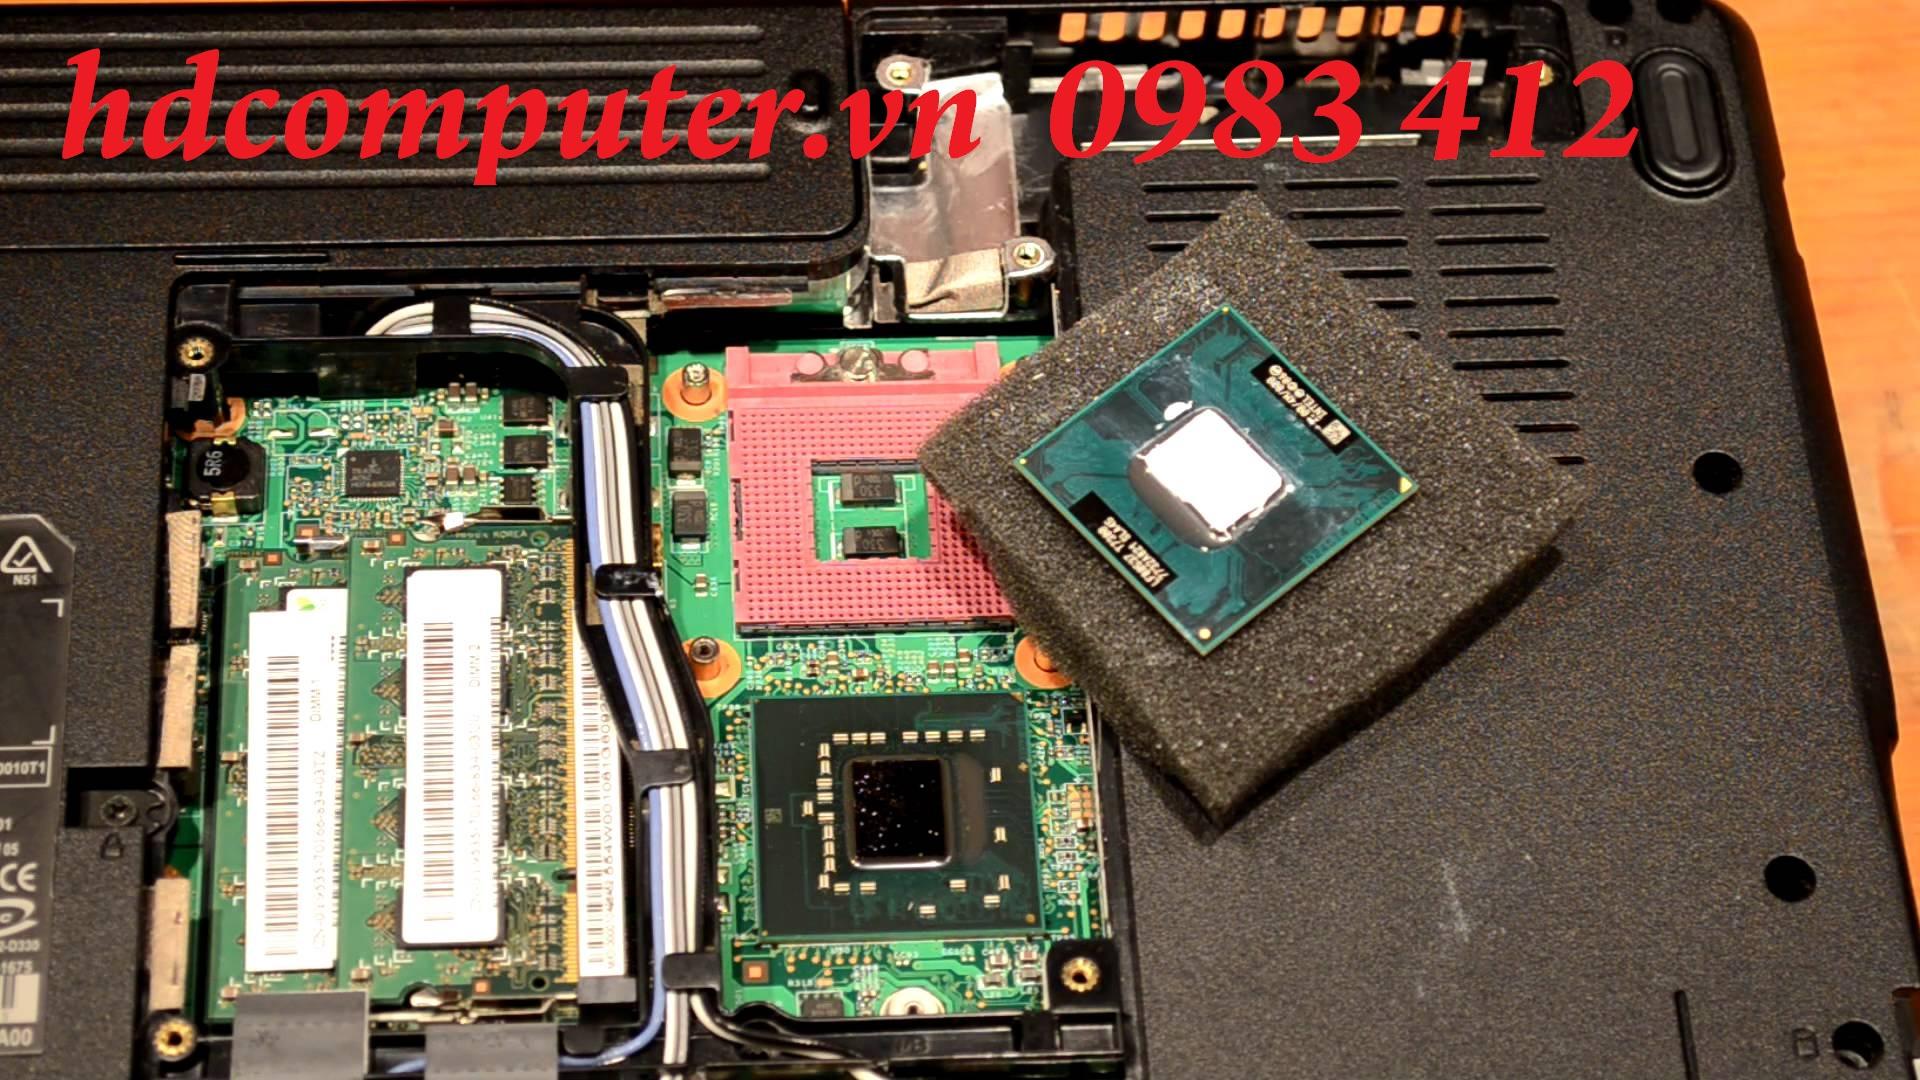 Sửa chữa Laptop Dell tại HCM